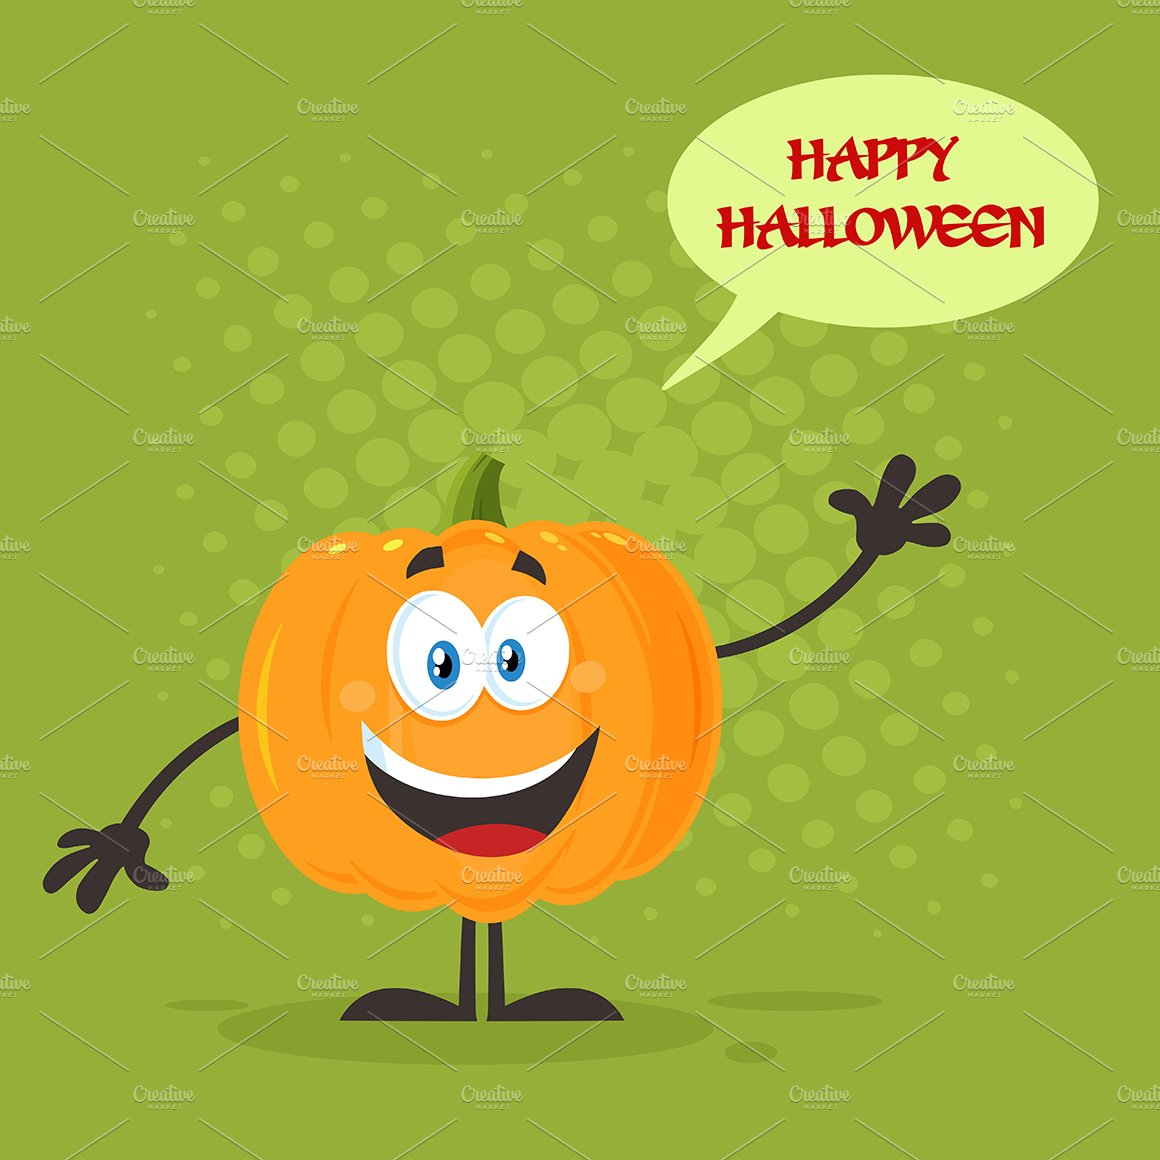 Orange Pumpkin Waving For Greeting Illustrations Creative Market